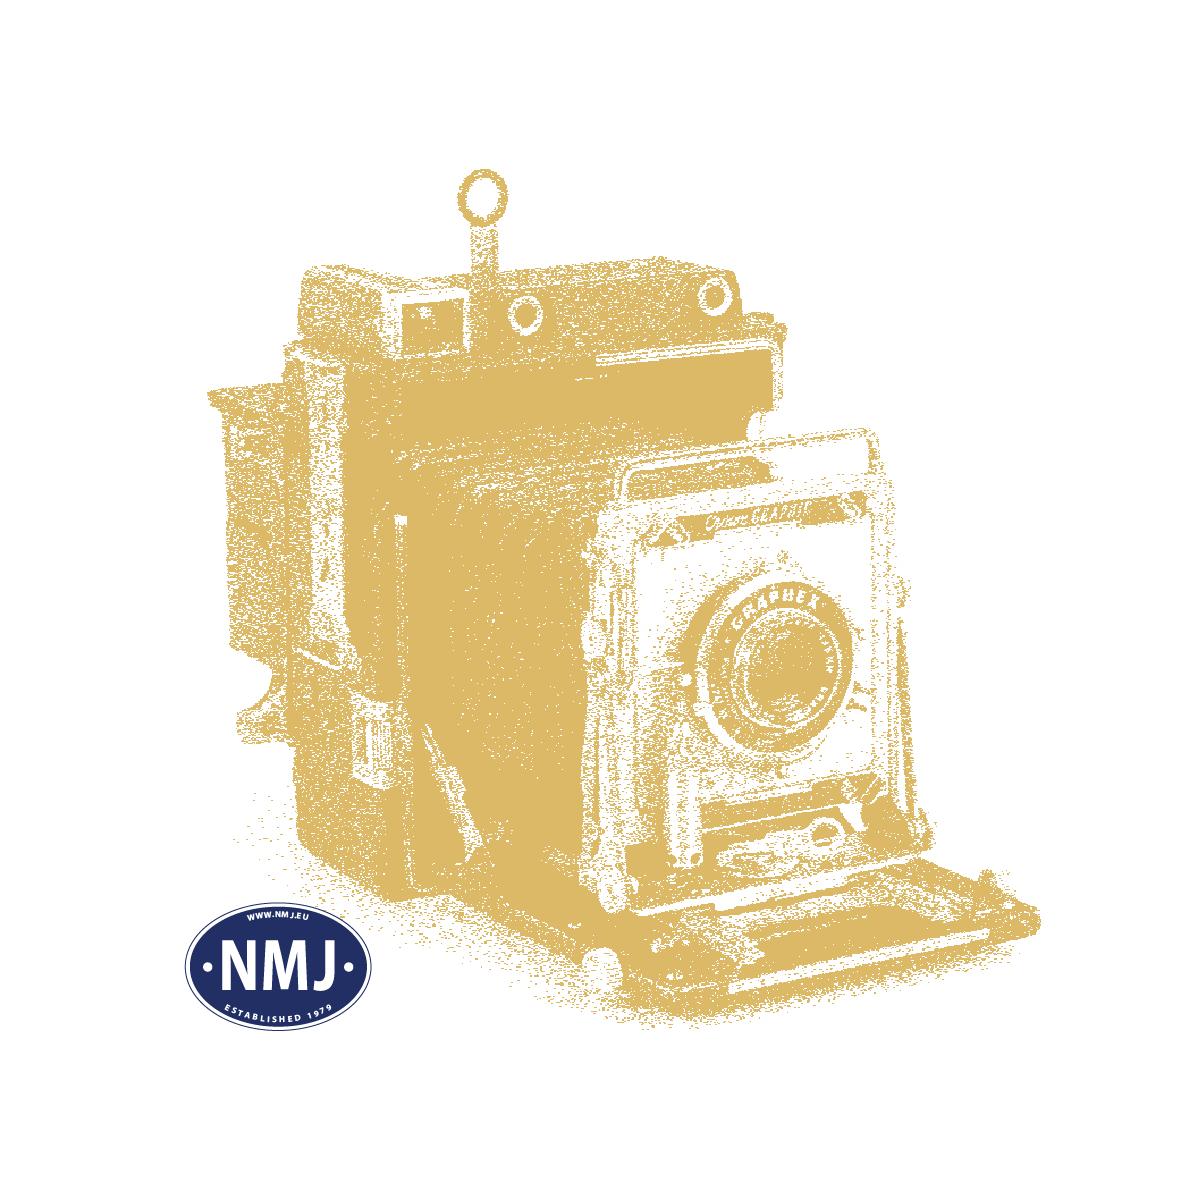 DK-8750073 - PBS Mx 1030, AC m/ Sound